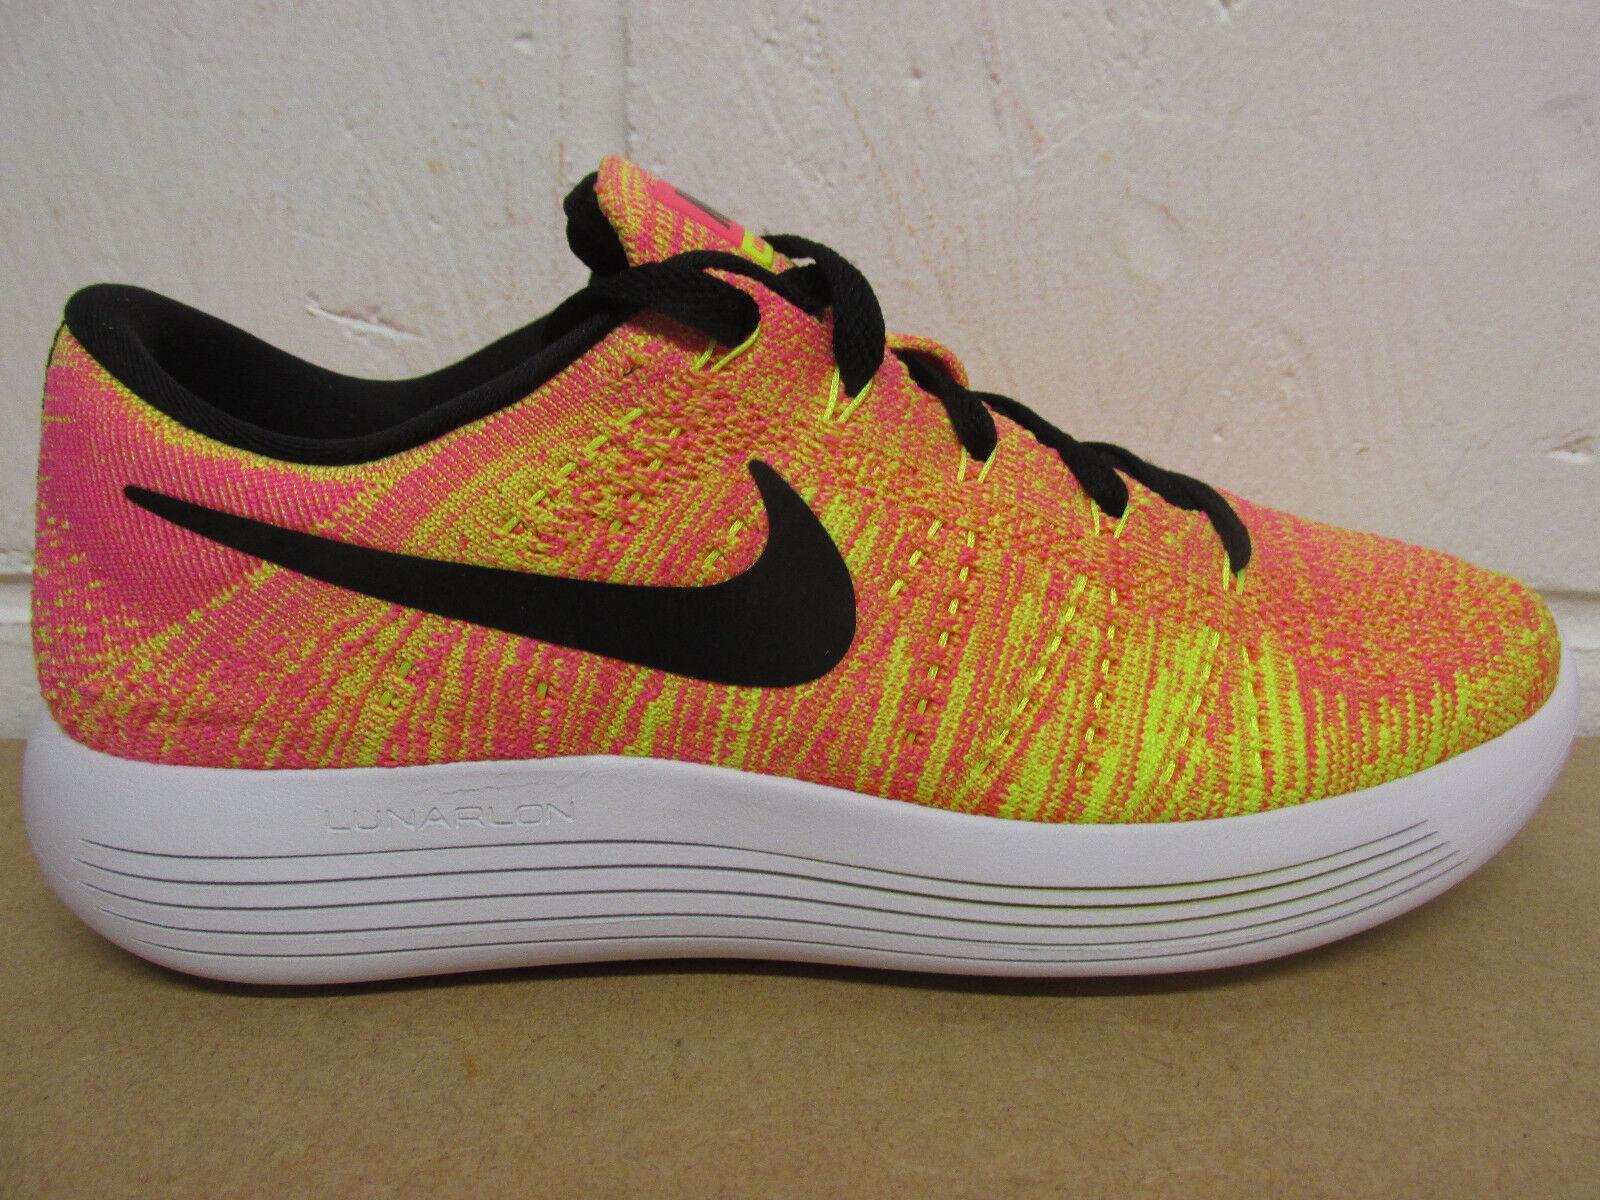 Nike Damen Laufschuhe Lunarepic Niedrig Flyknit Oc Laufschuhe Damen 844863 999 Turnschuhe b69cac